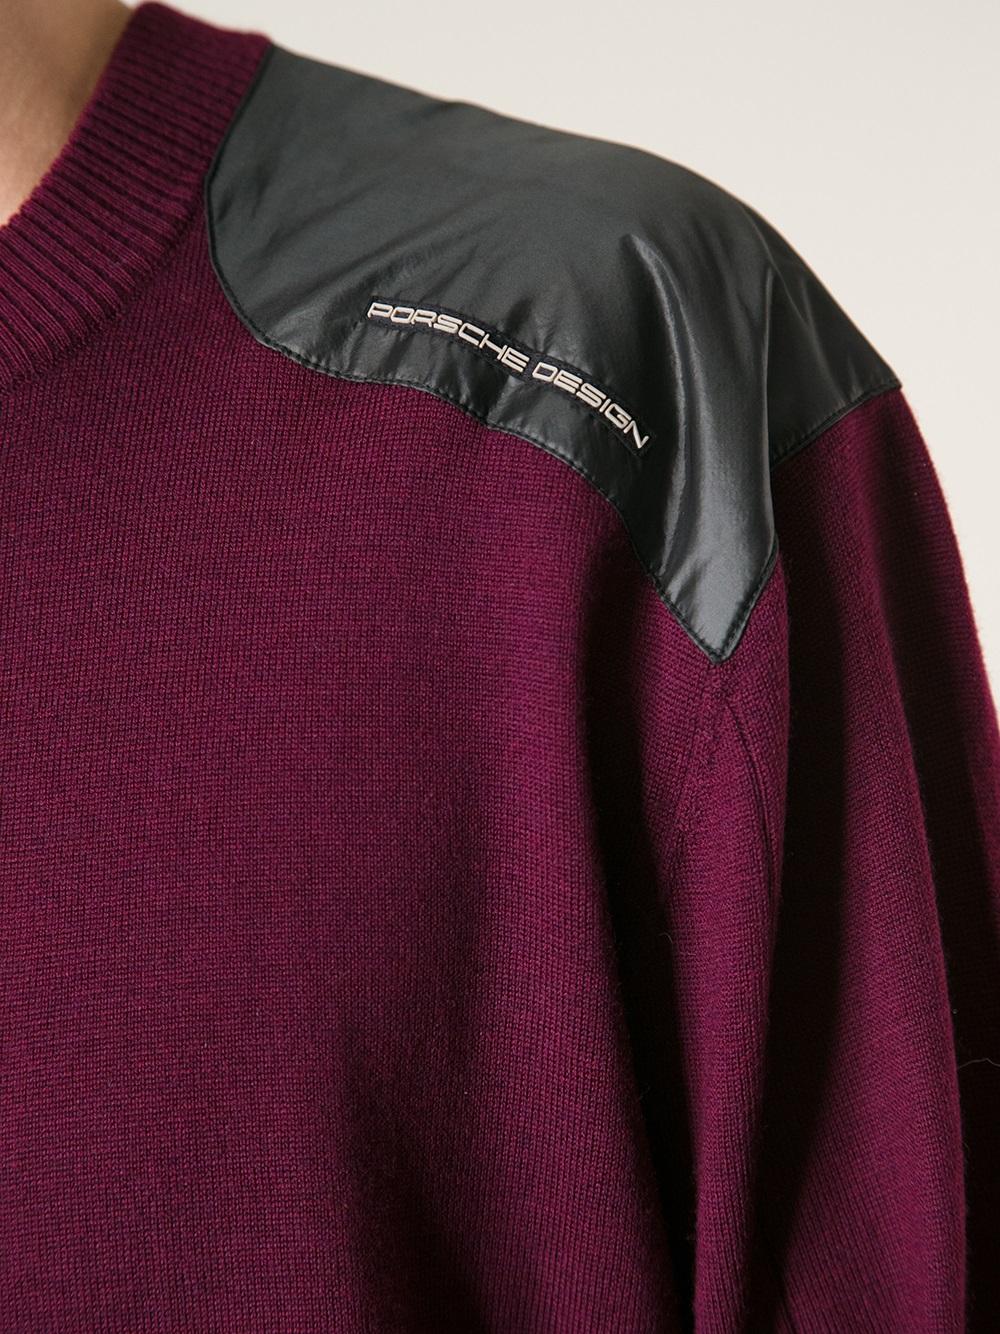 Lyst - Porsche Design Crew Neck Sweater in Red for Men ef31c9c35